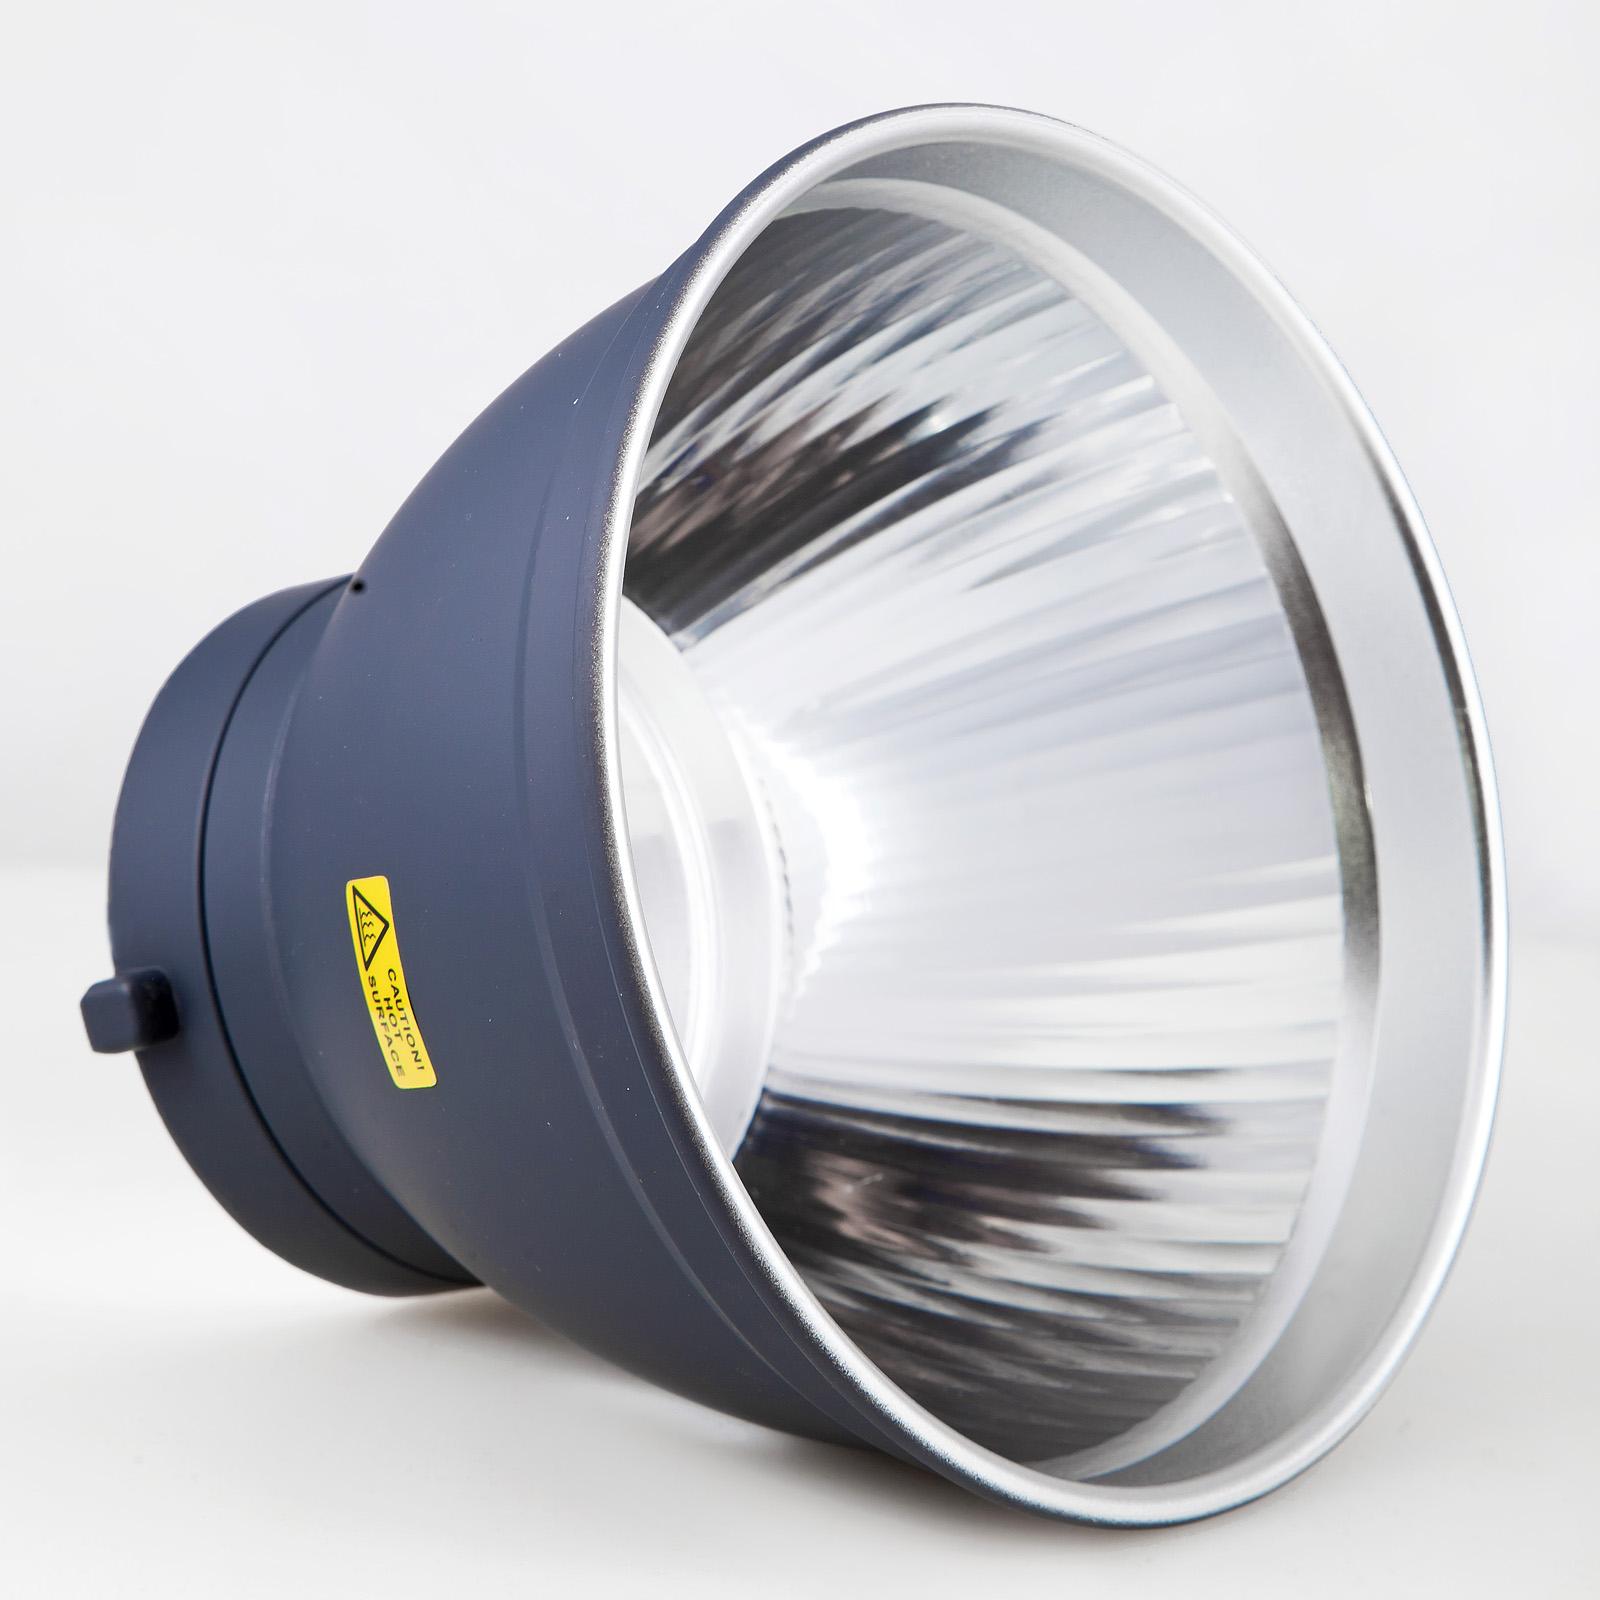 mircopro Рефлектор стандартный Mircopro SF-610 (байонет Bowens)